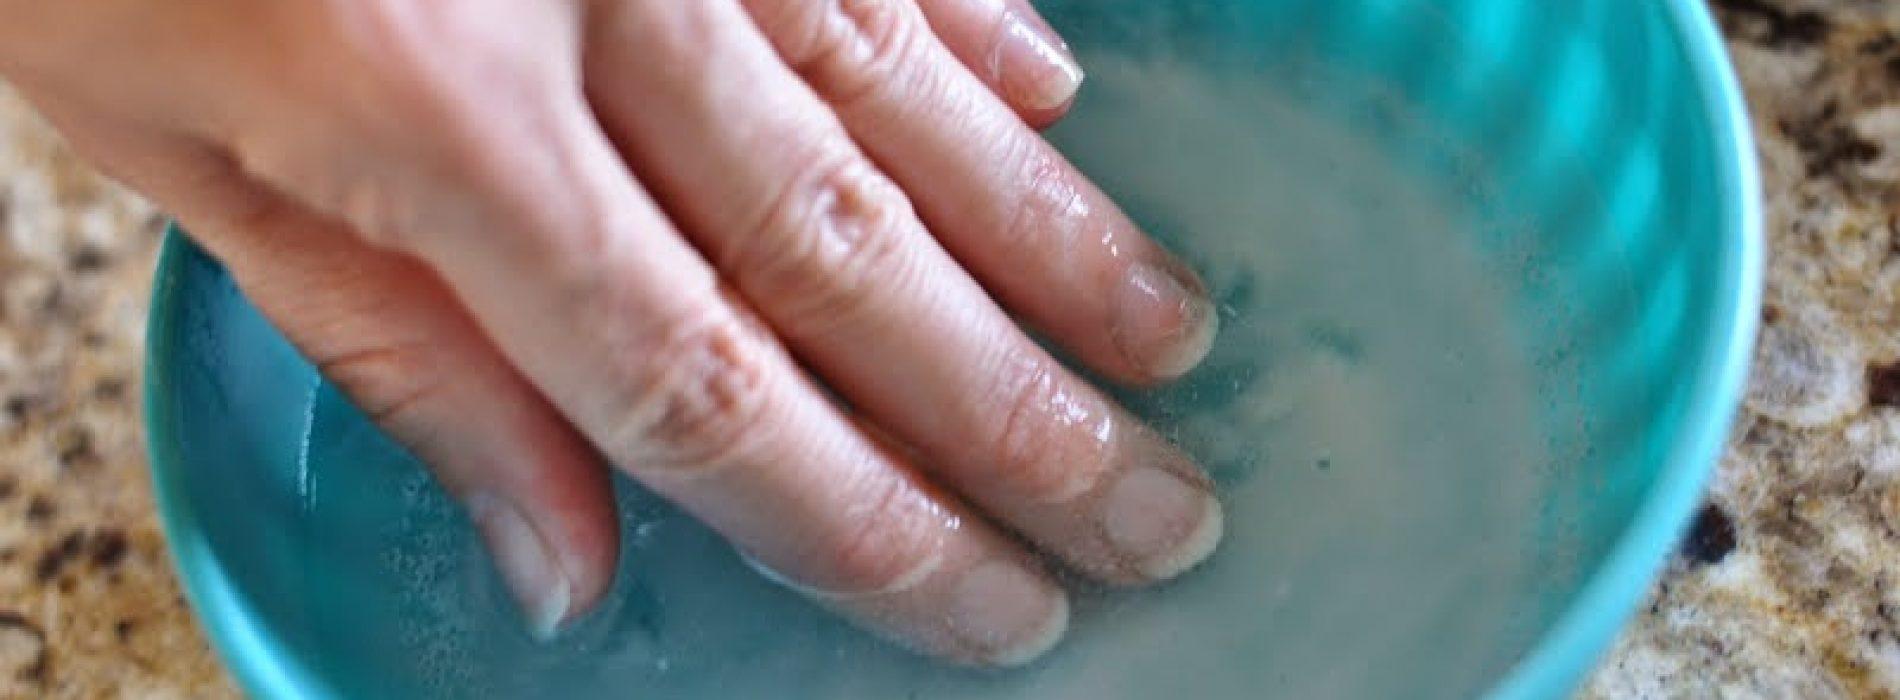 Last van zwakke broze nagels? Dit middeltje zal je nagels sterker maken!